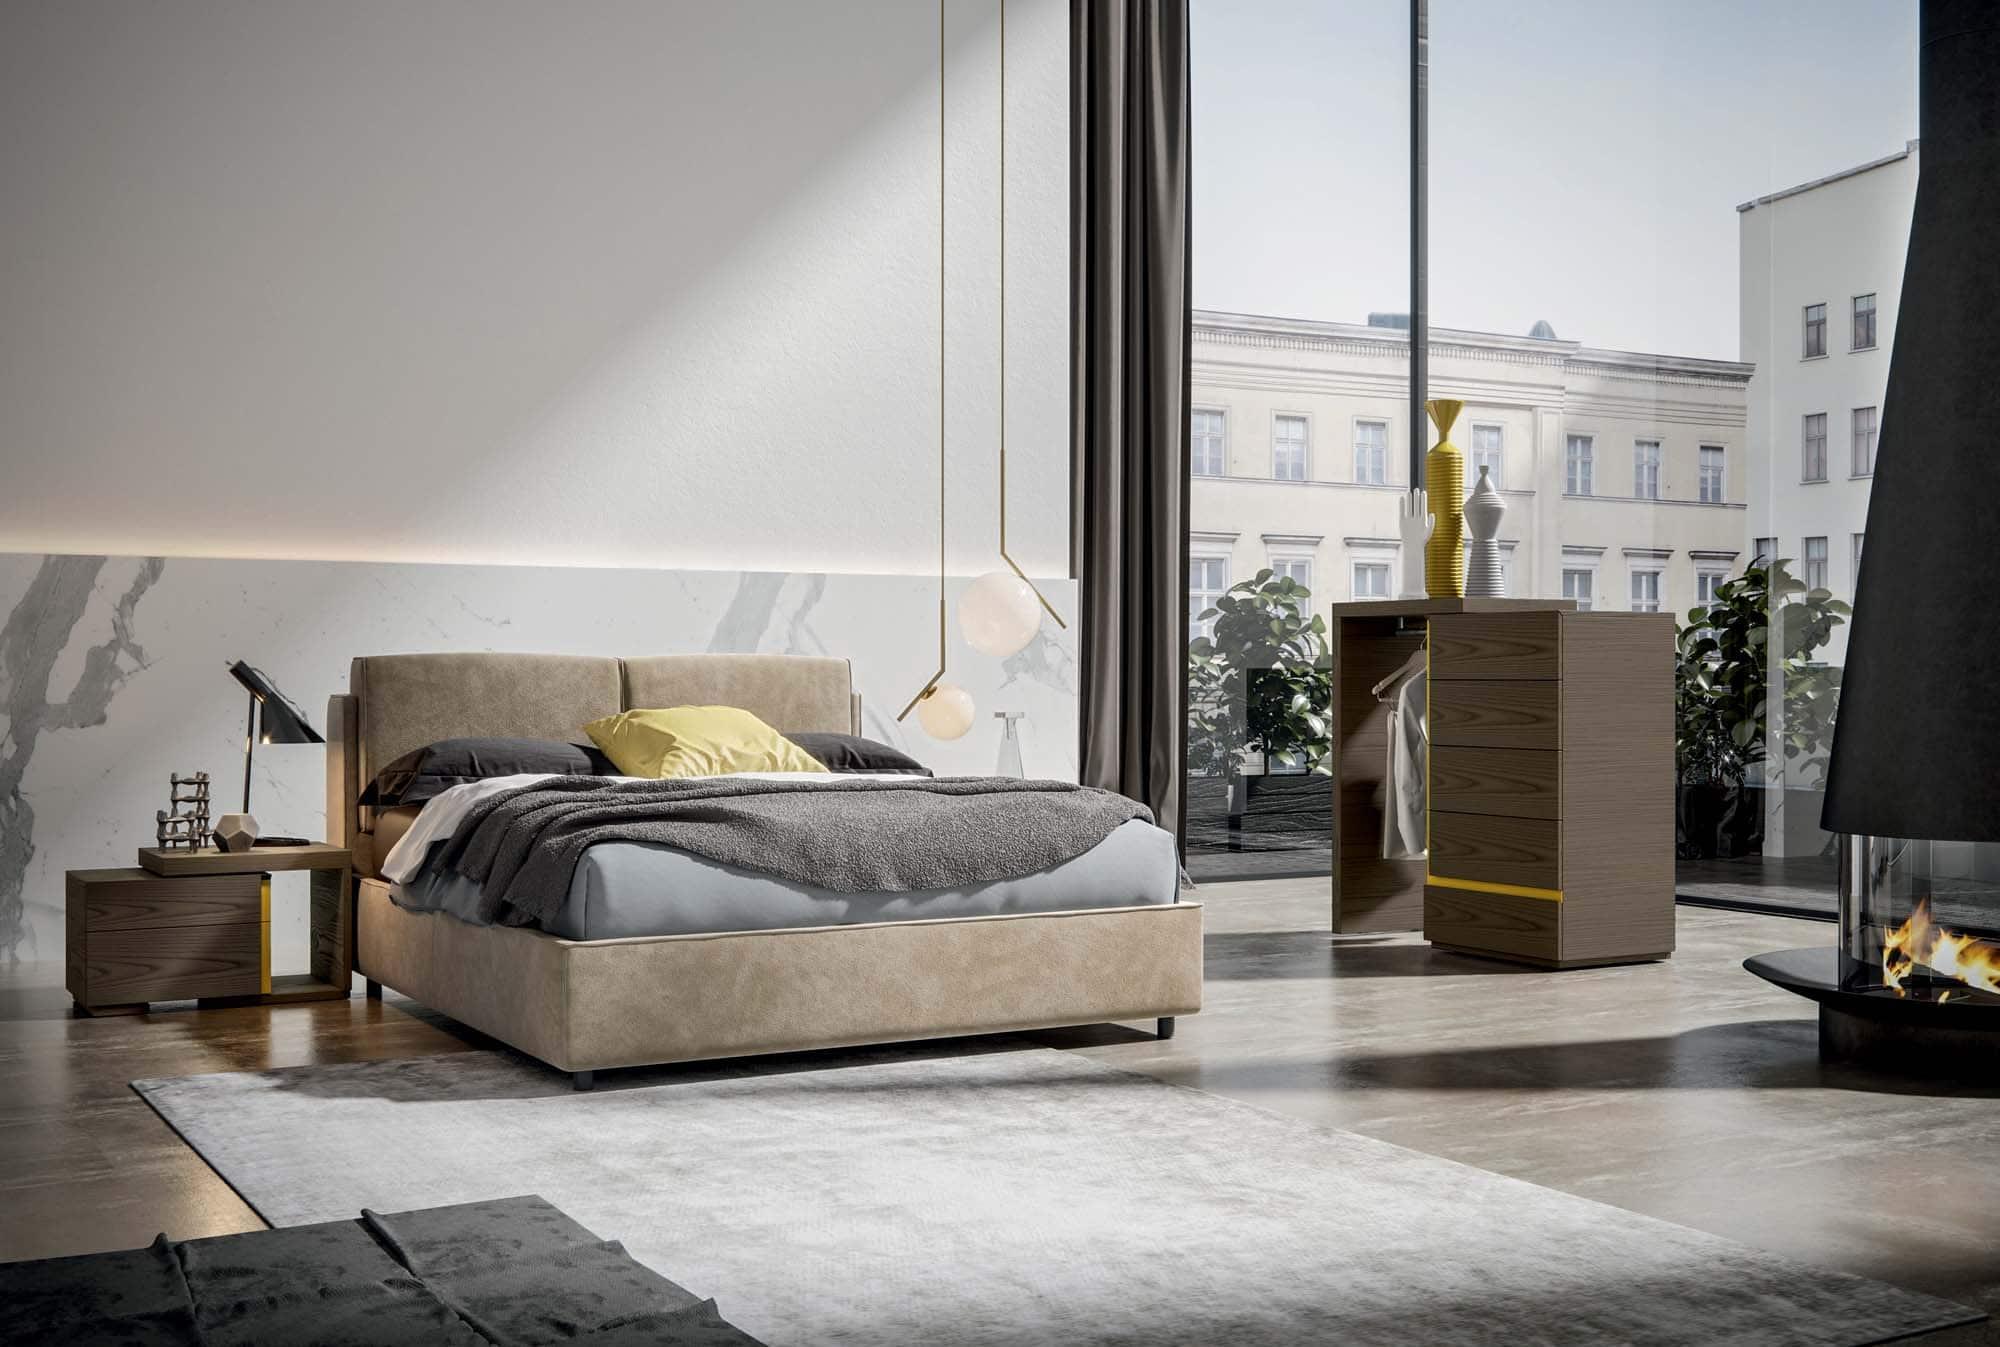 Varo letto veneran mobili for Ethos arredamenti